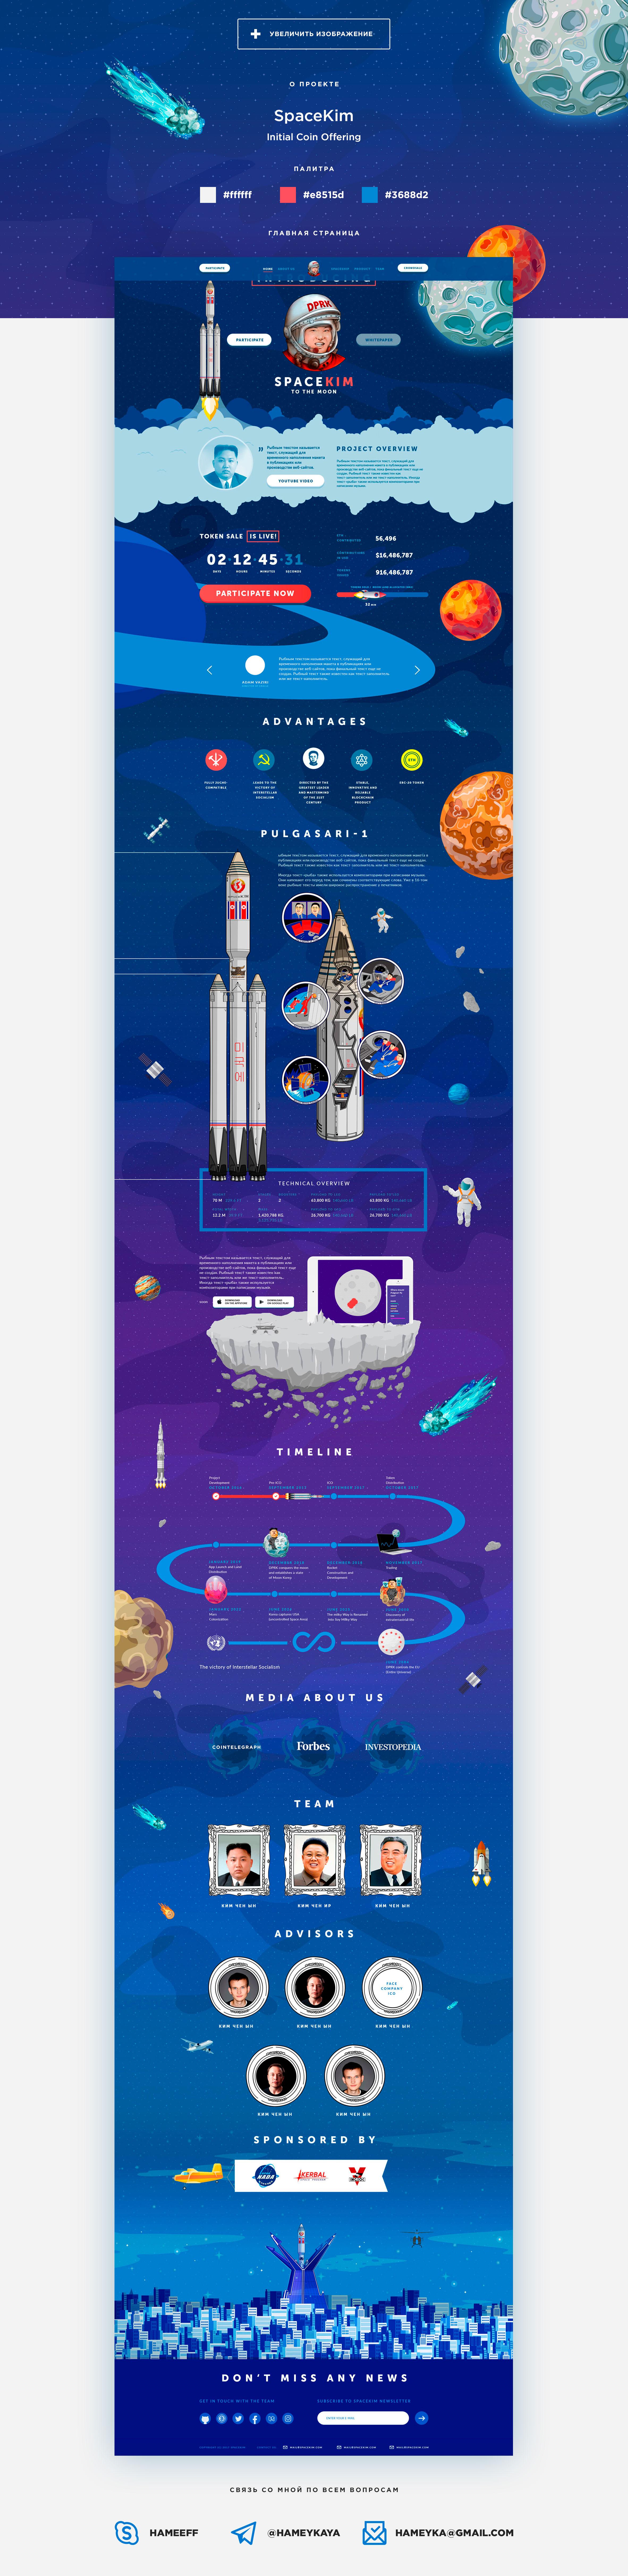 ICO SpaceKim